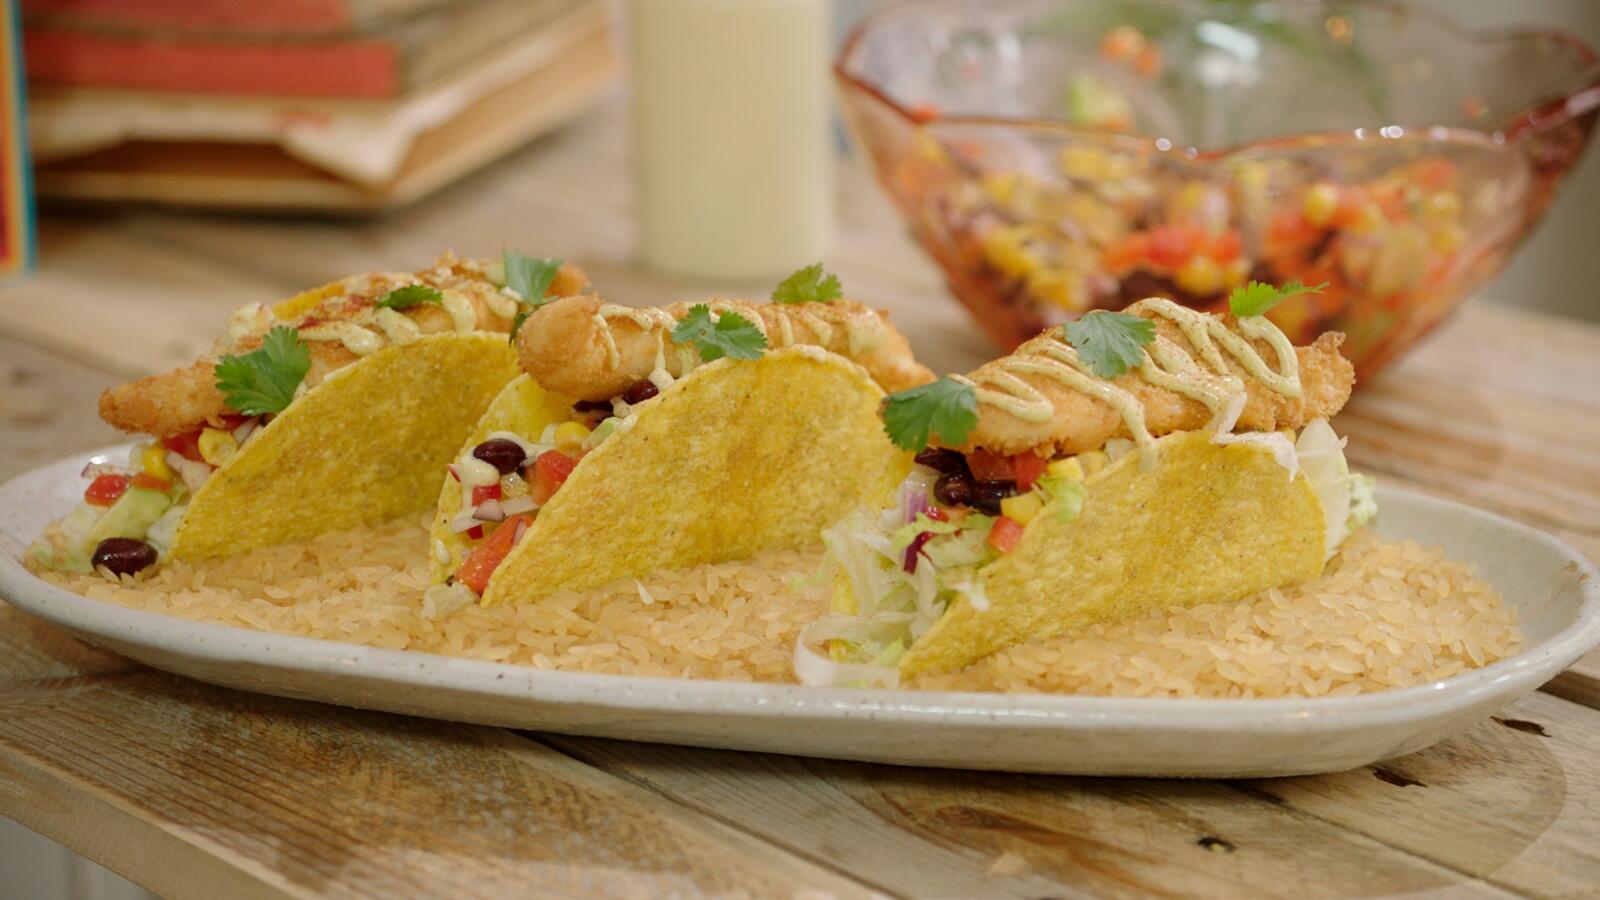 Taco met goujonettes van schartong, avocadomayonaise en Mexicaanse sla